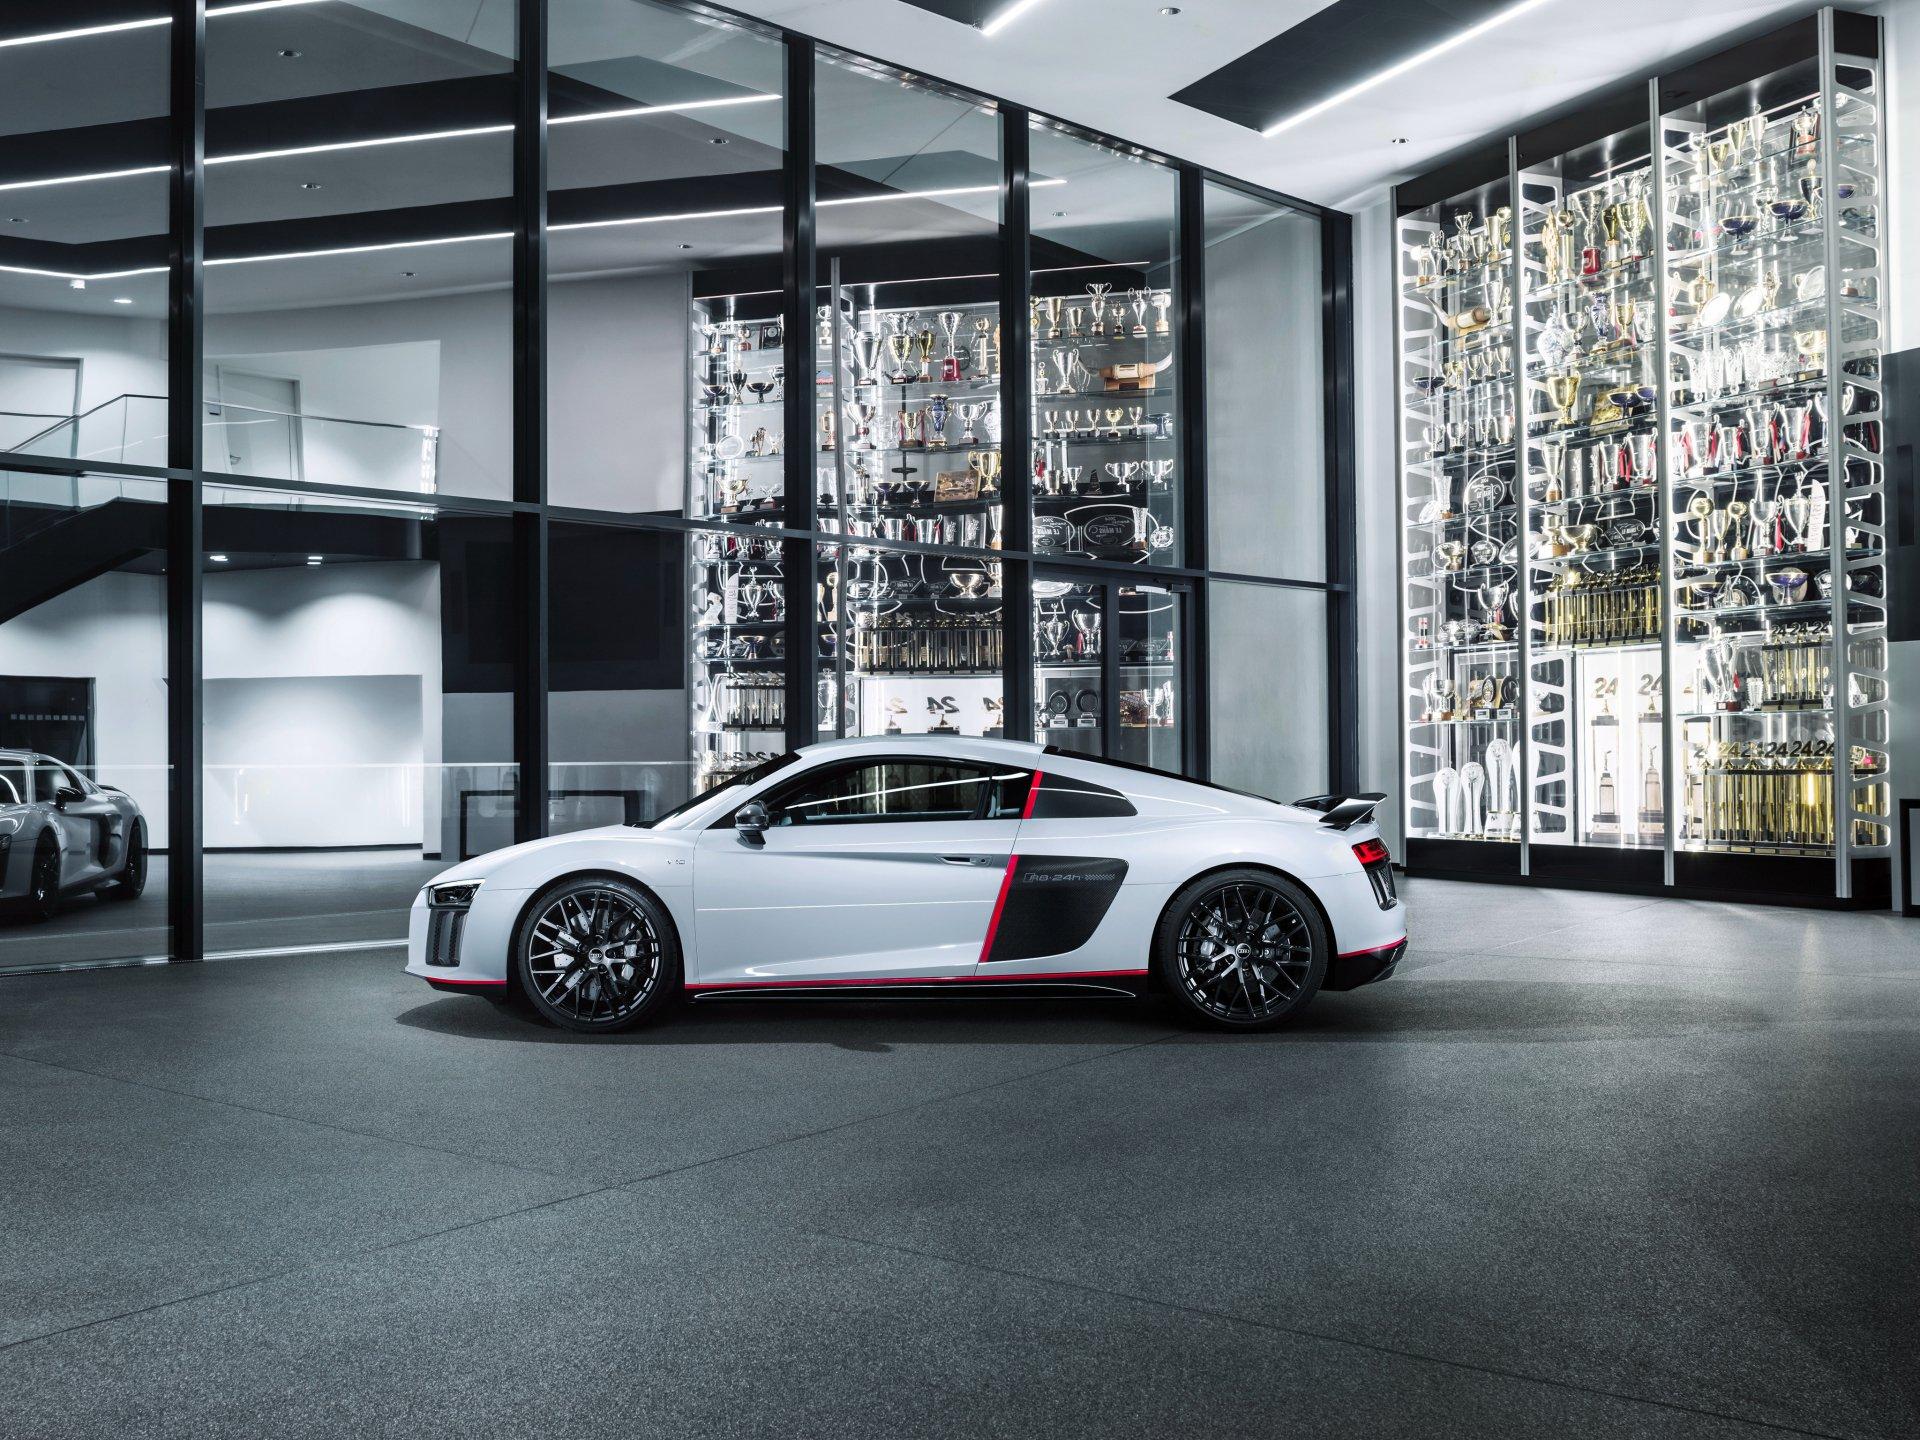 Vehicles - Audi R8  Audi Wallpaper